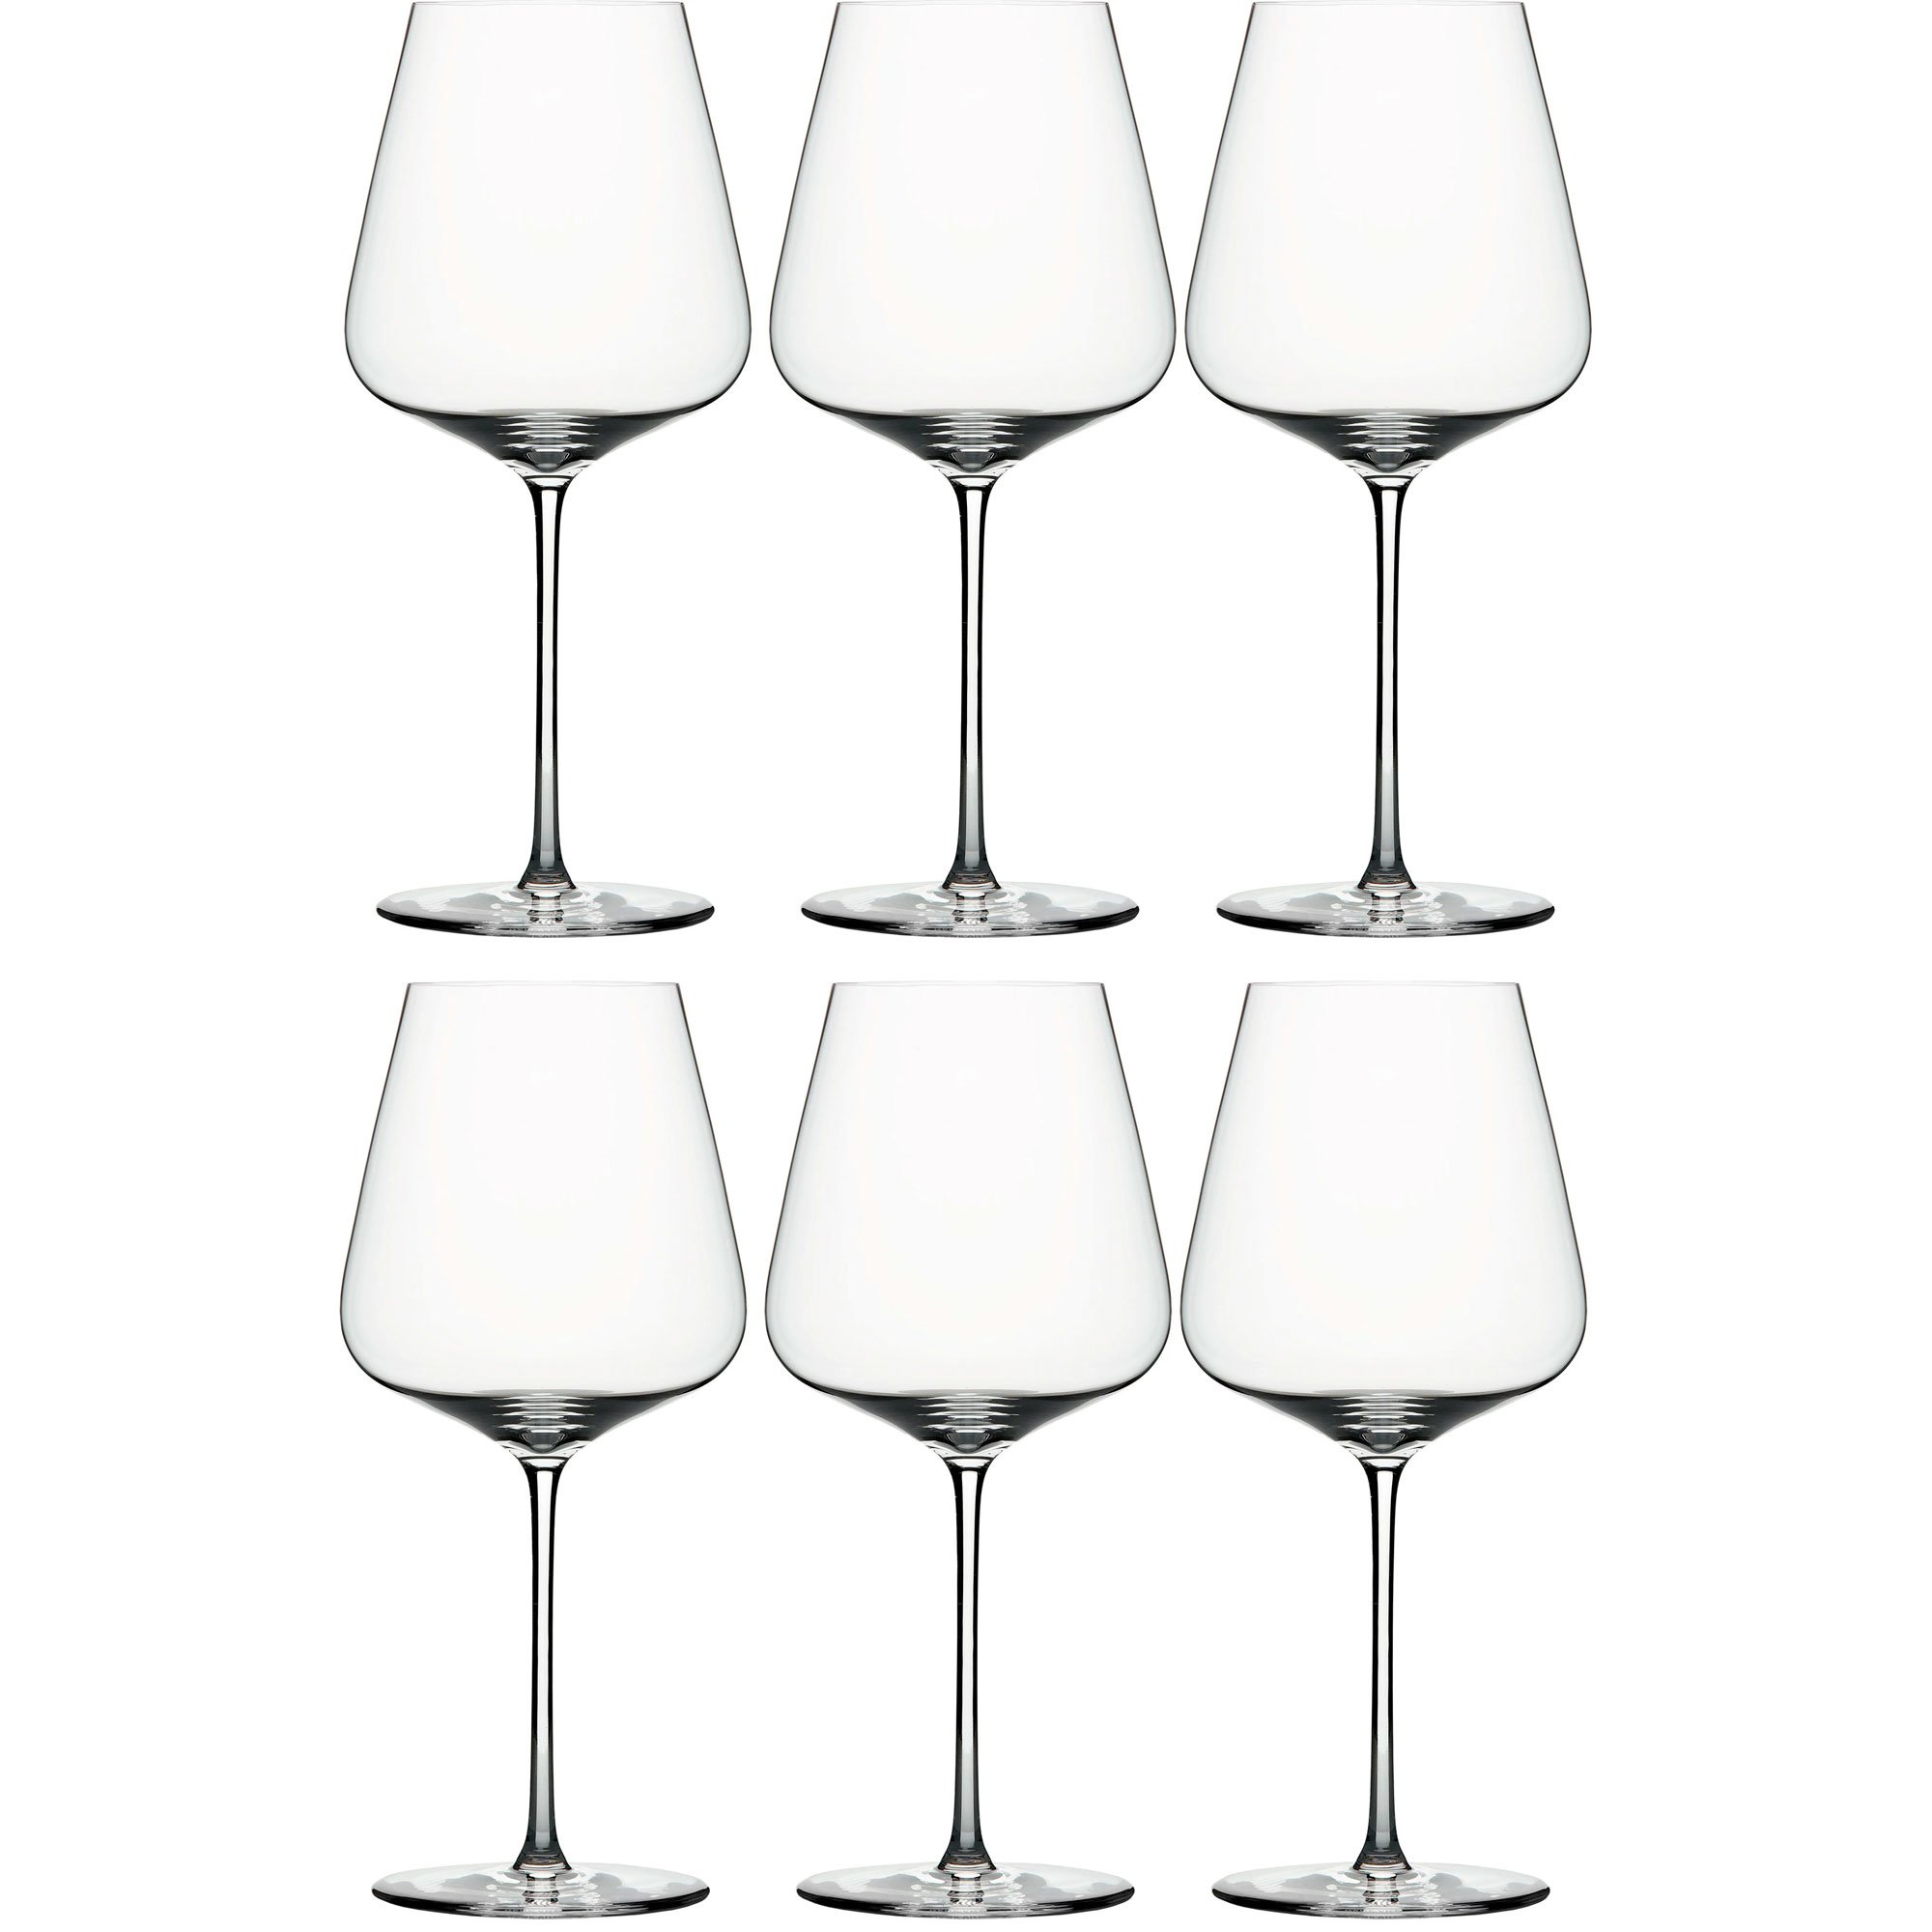 Zalto Bordeaux vinglas 765 ml. 6 st.